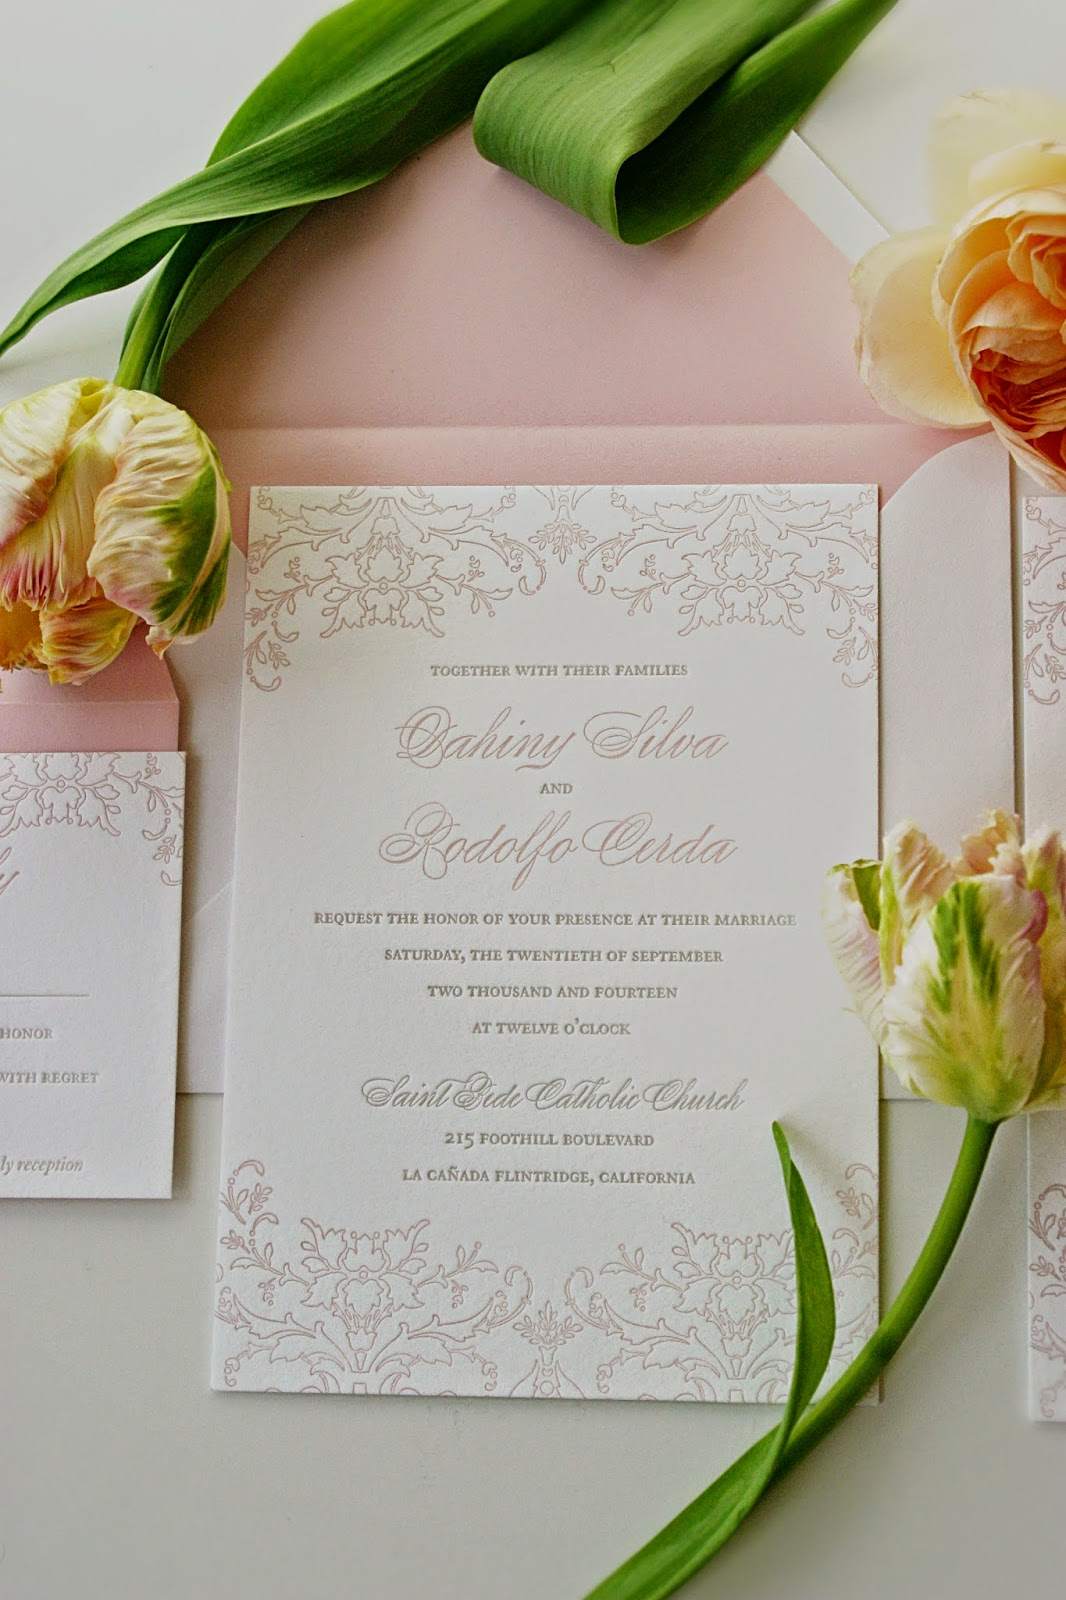 Pink Damask Invitation Wedding Letterpress Invitation by Sweetly Said